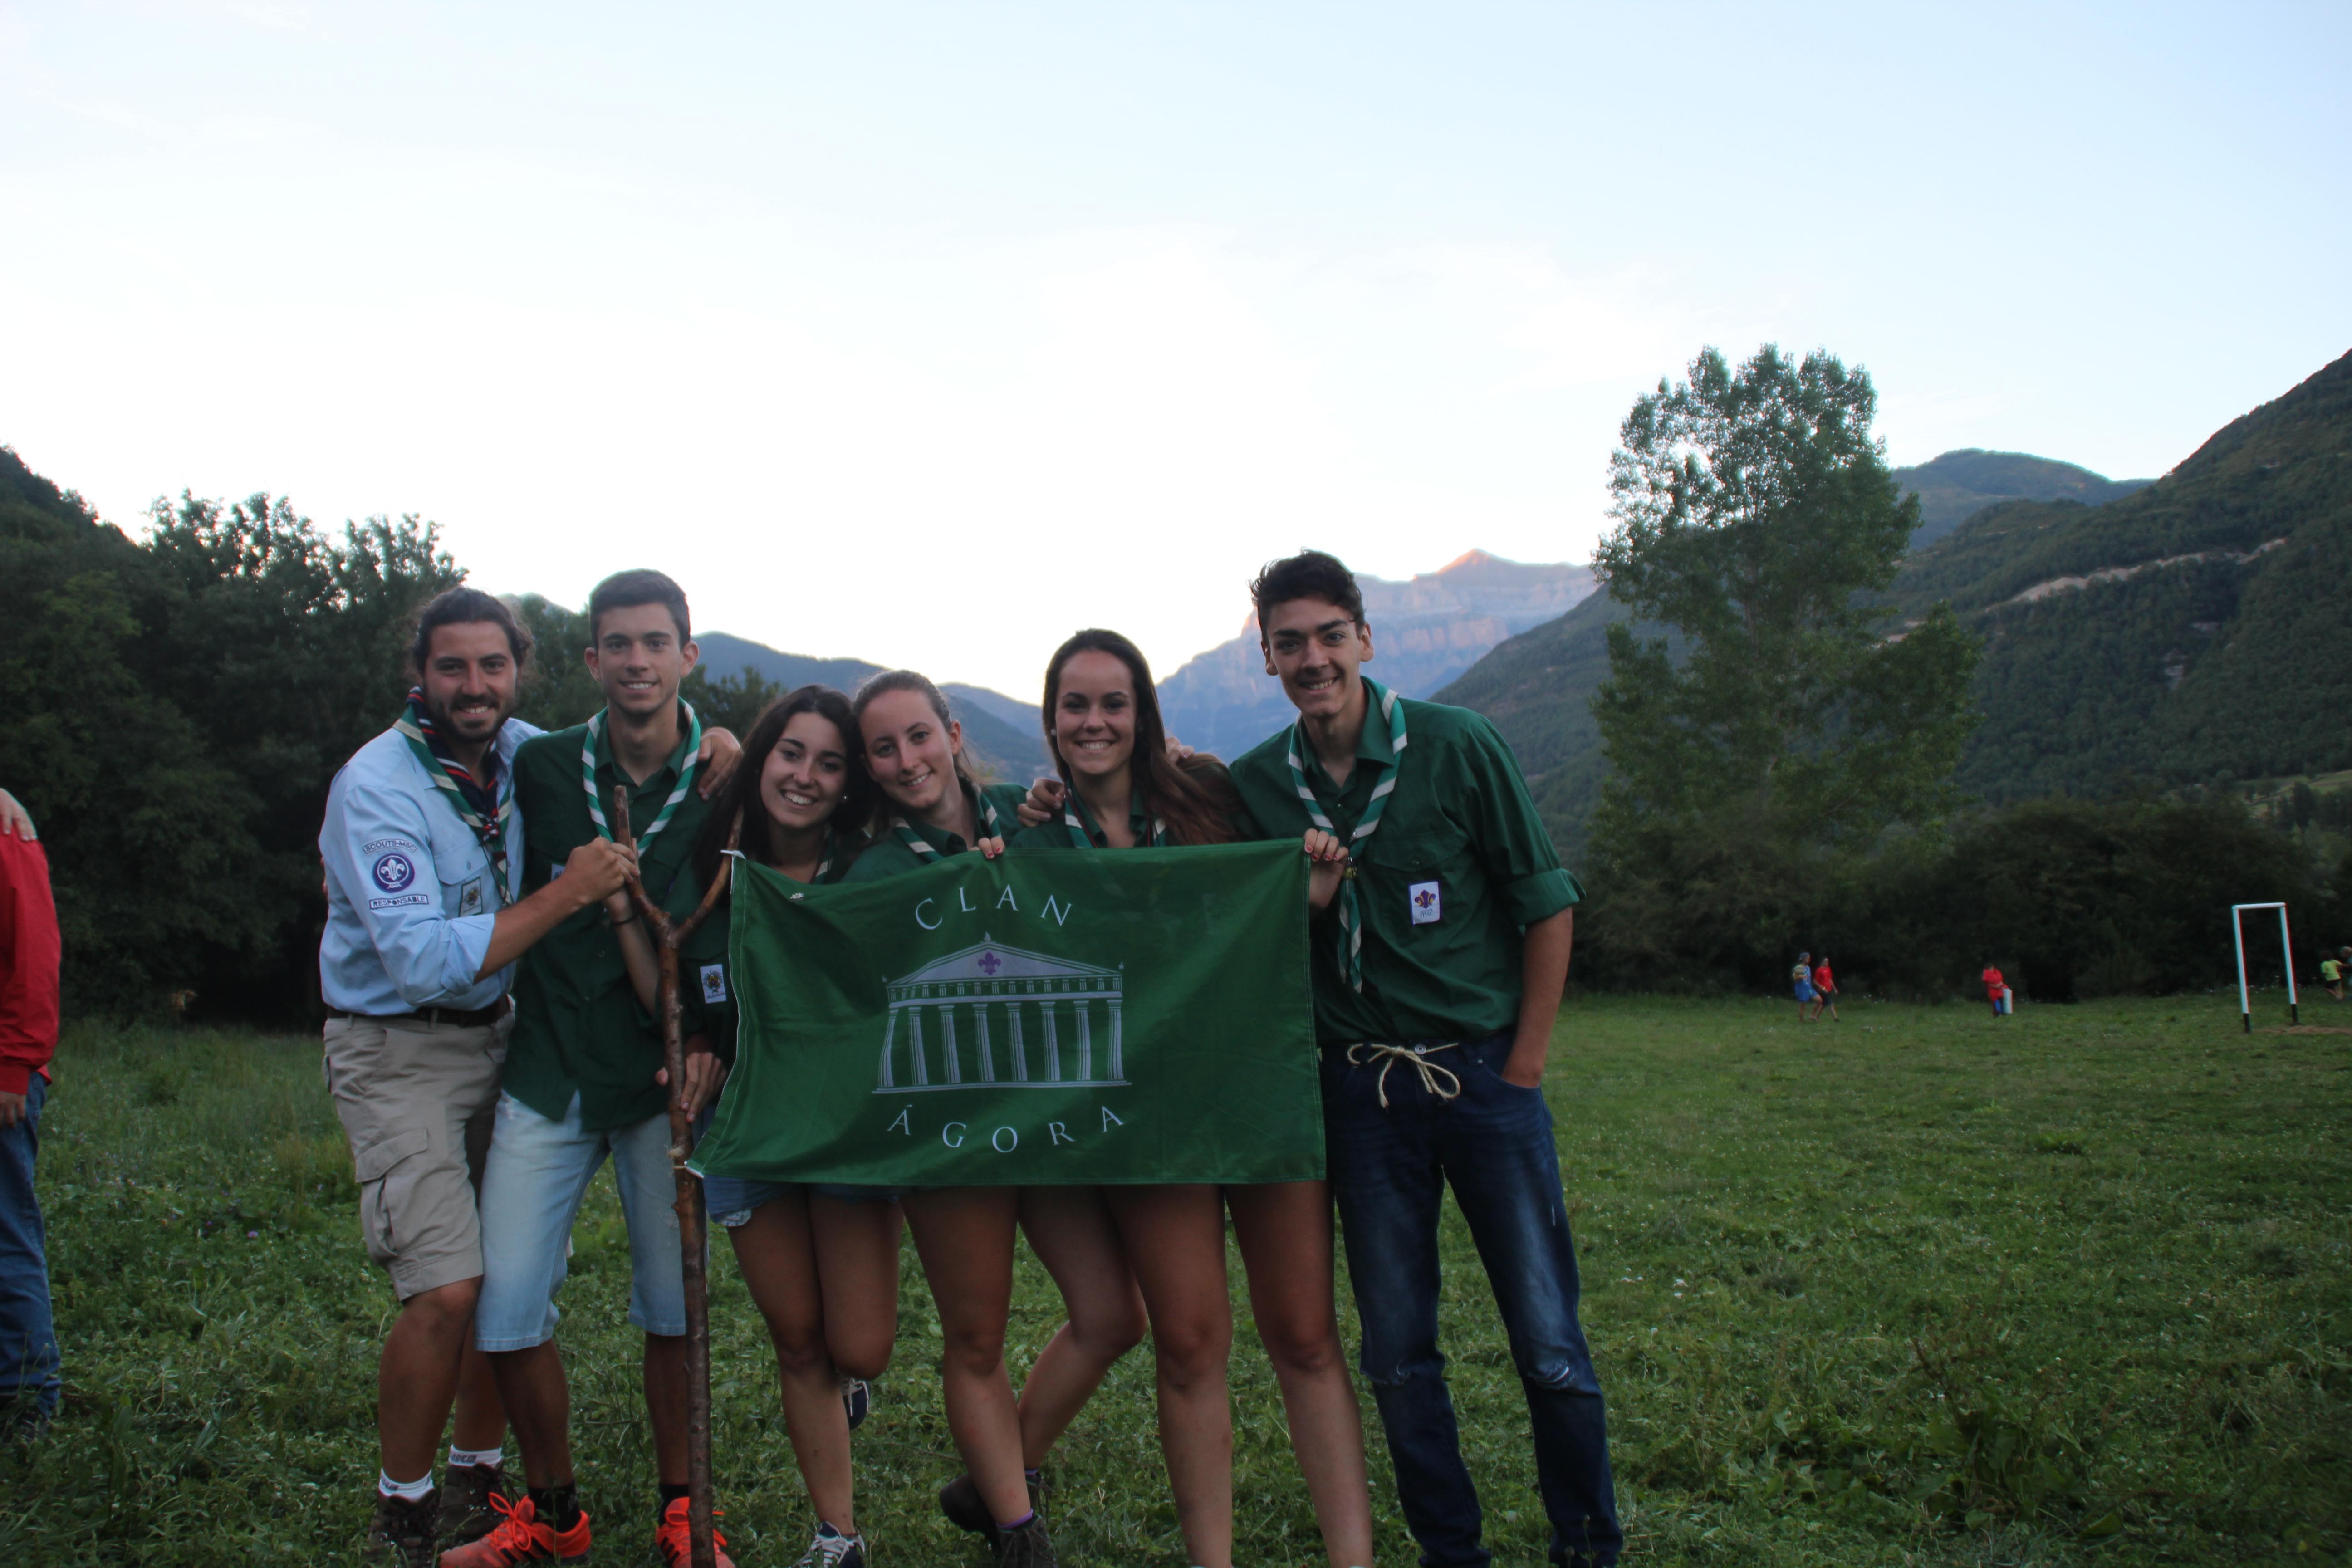 15-16 - Grupo - Campamento de verano - P423